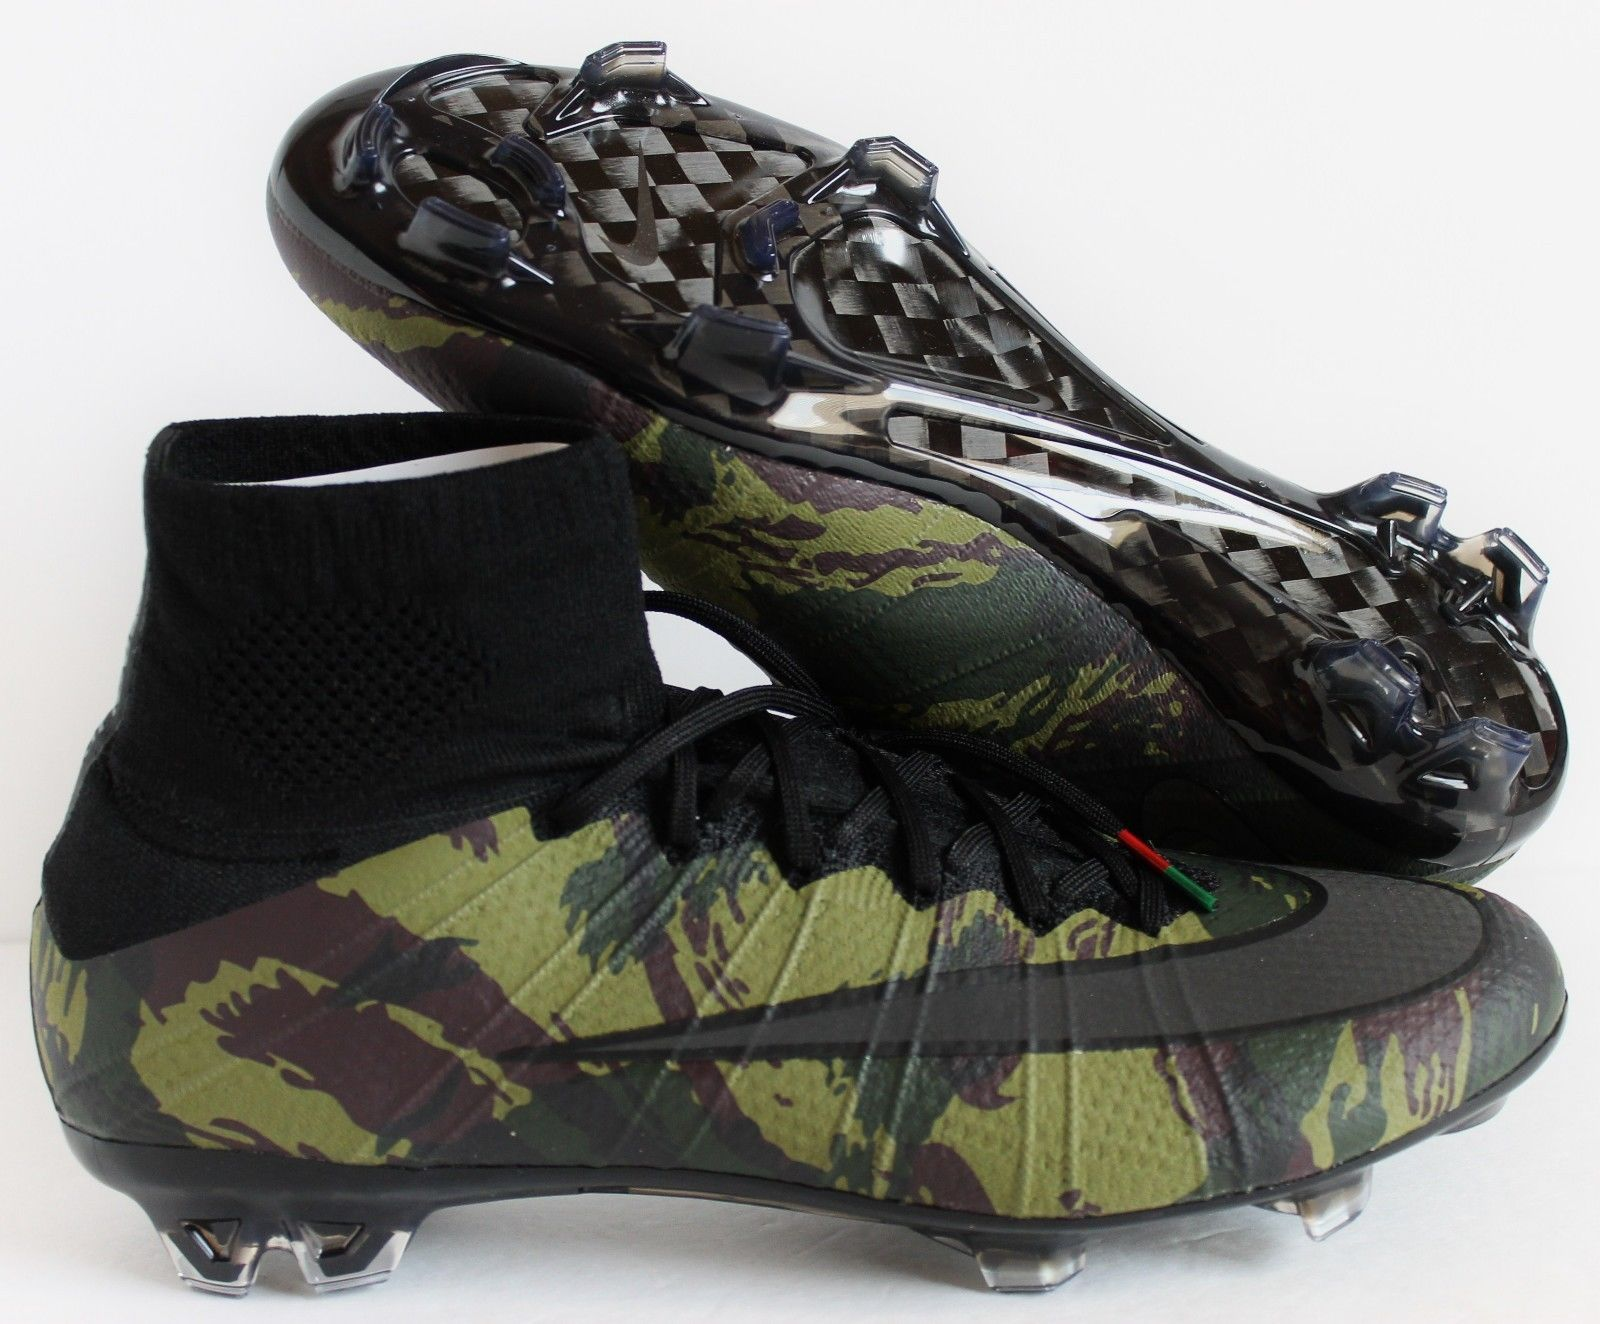 835363300 Men Niek Mercurial Fly Iv Fg Football Shoes Super Deals